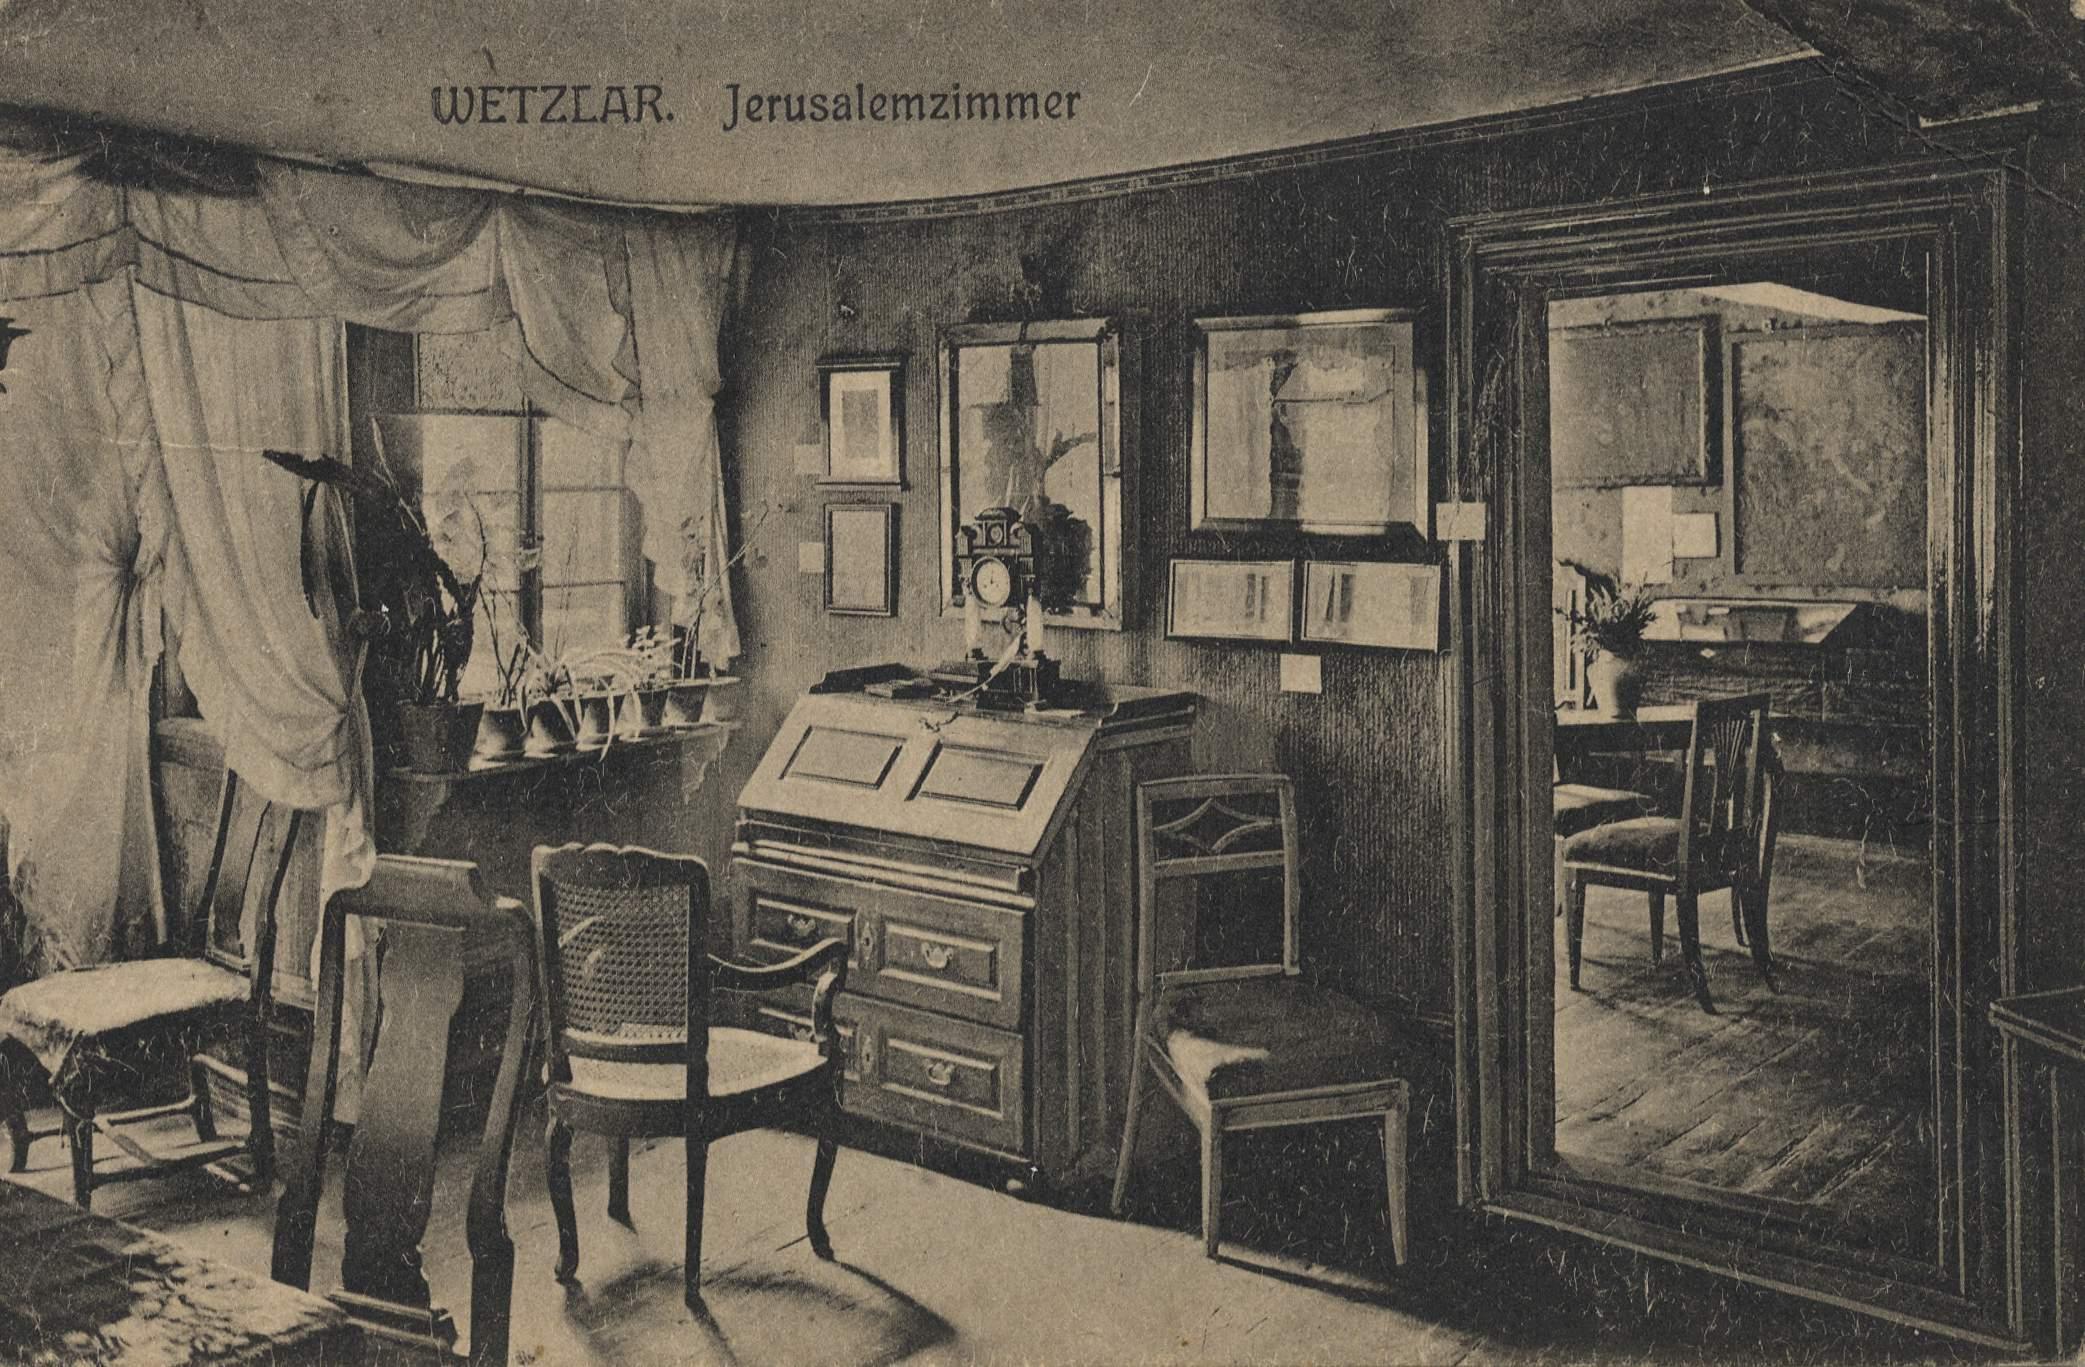 wetzlar hessen jerusalemzimmer. Black Bedroom Furniture Sets. Home Design Ideas